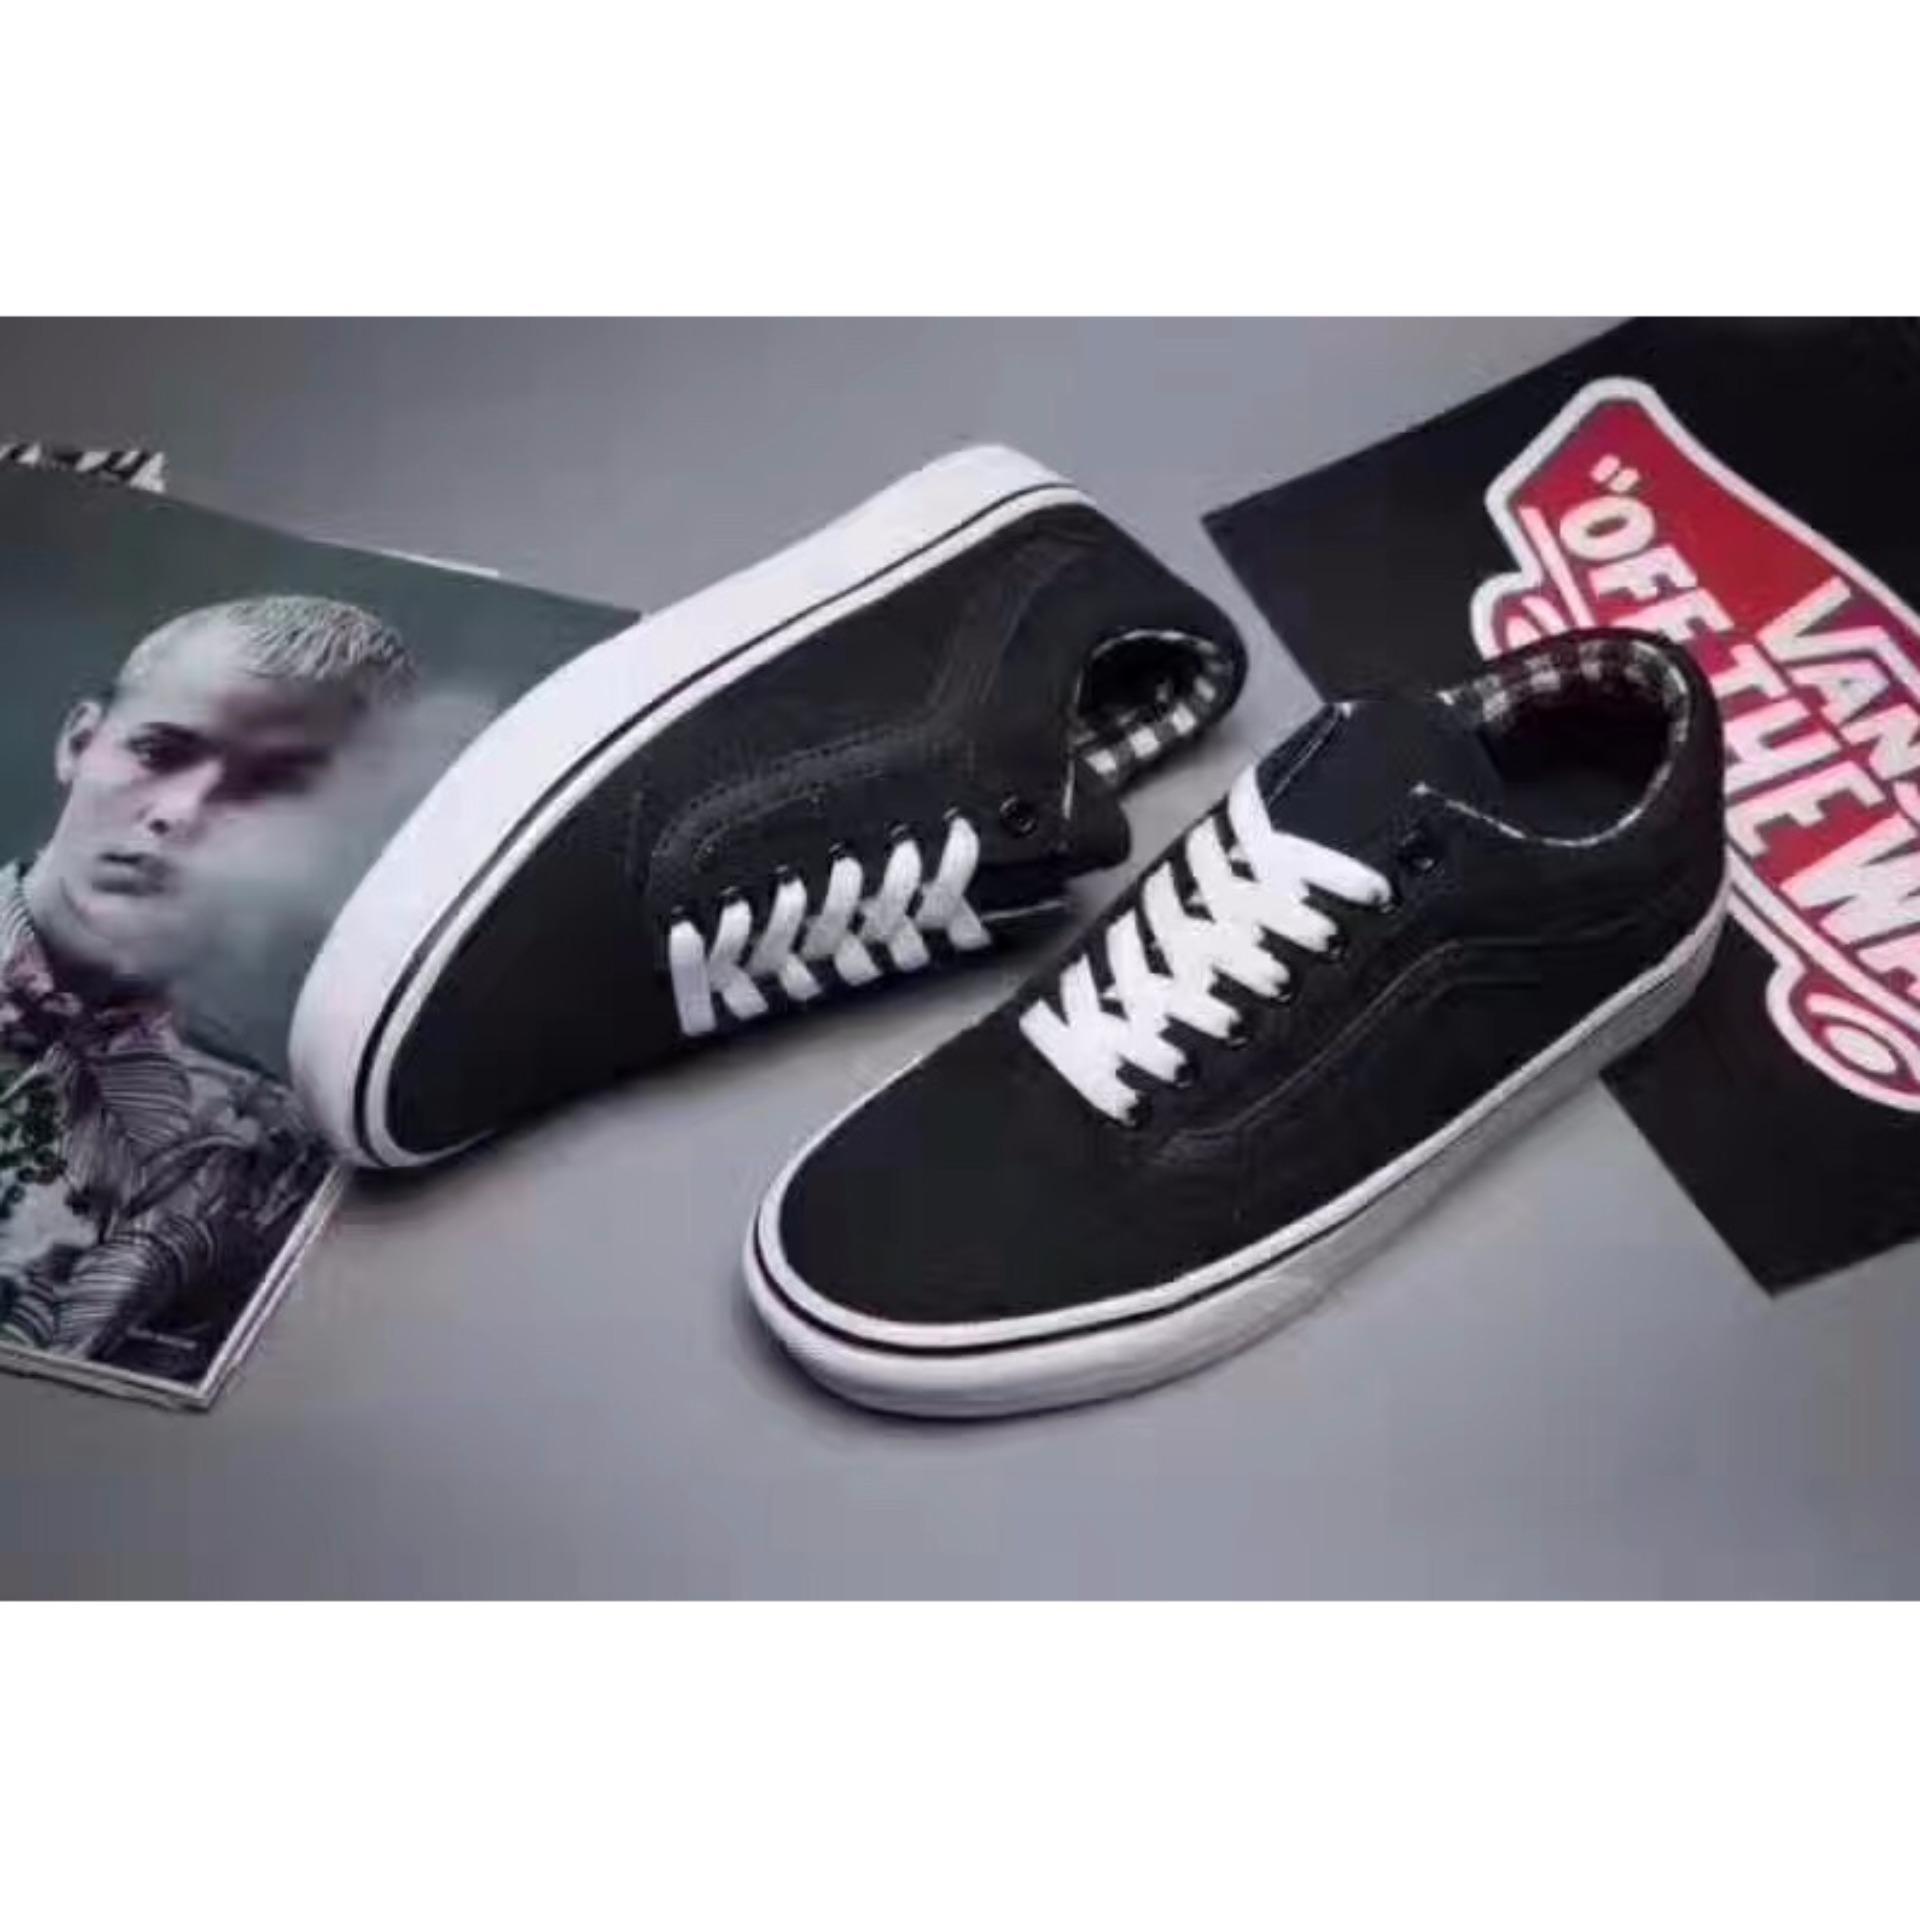 bfc98b79243d0a Intl Price Skate Philippines Vans Unisex Old Shoe Checker Skool YRwH1S